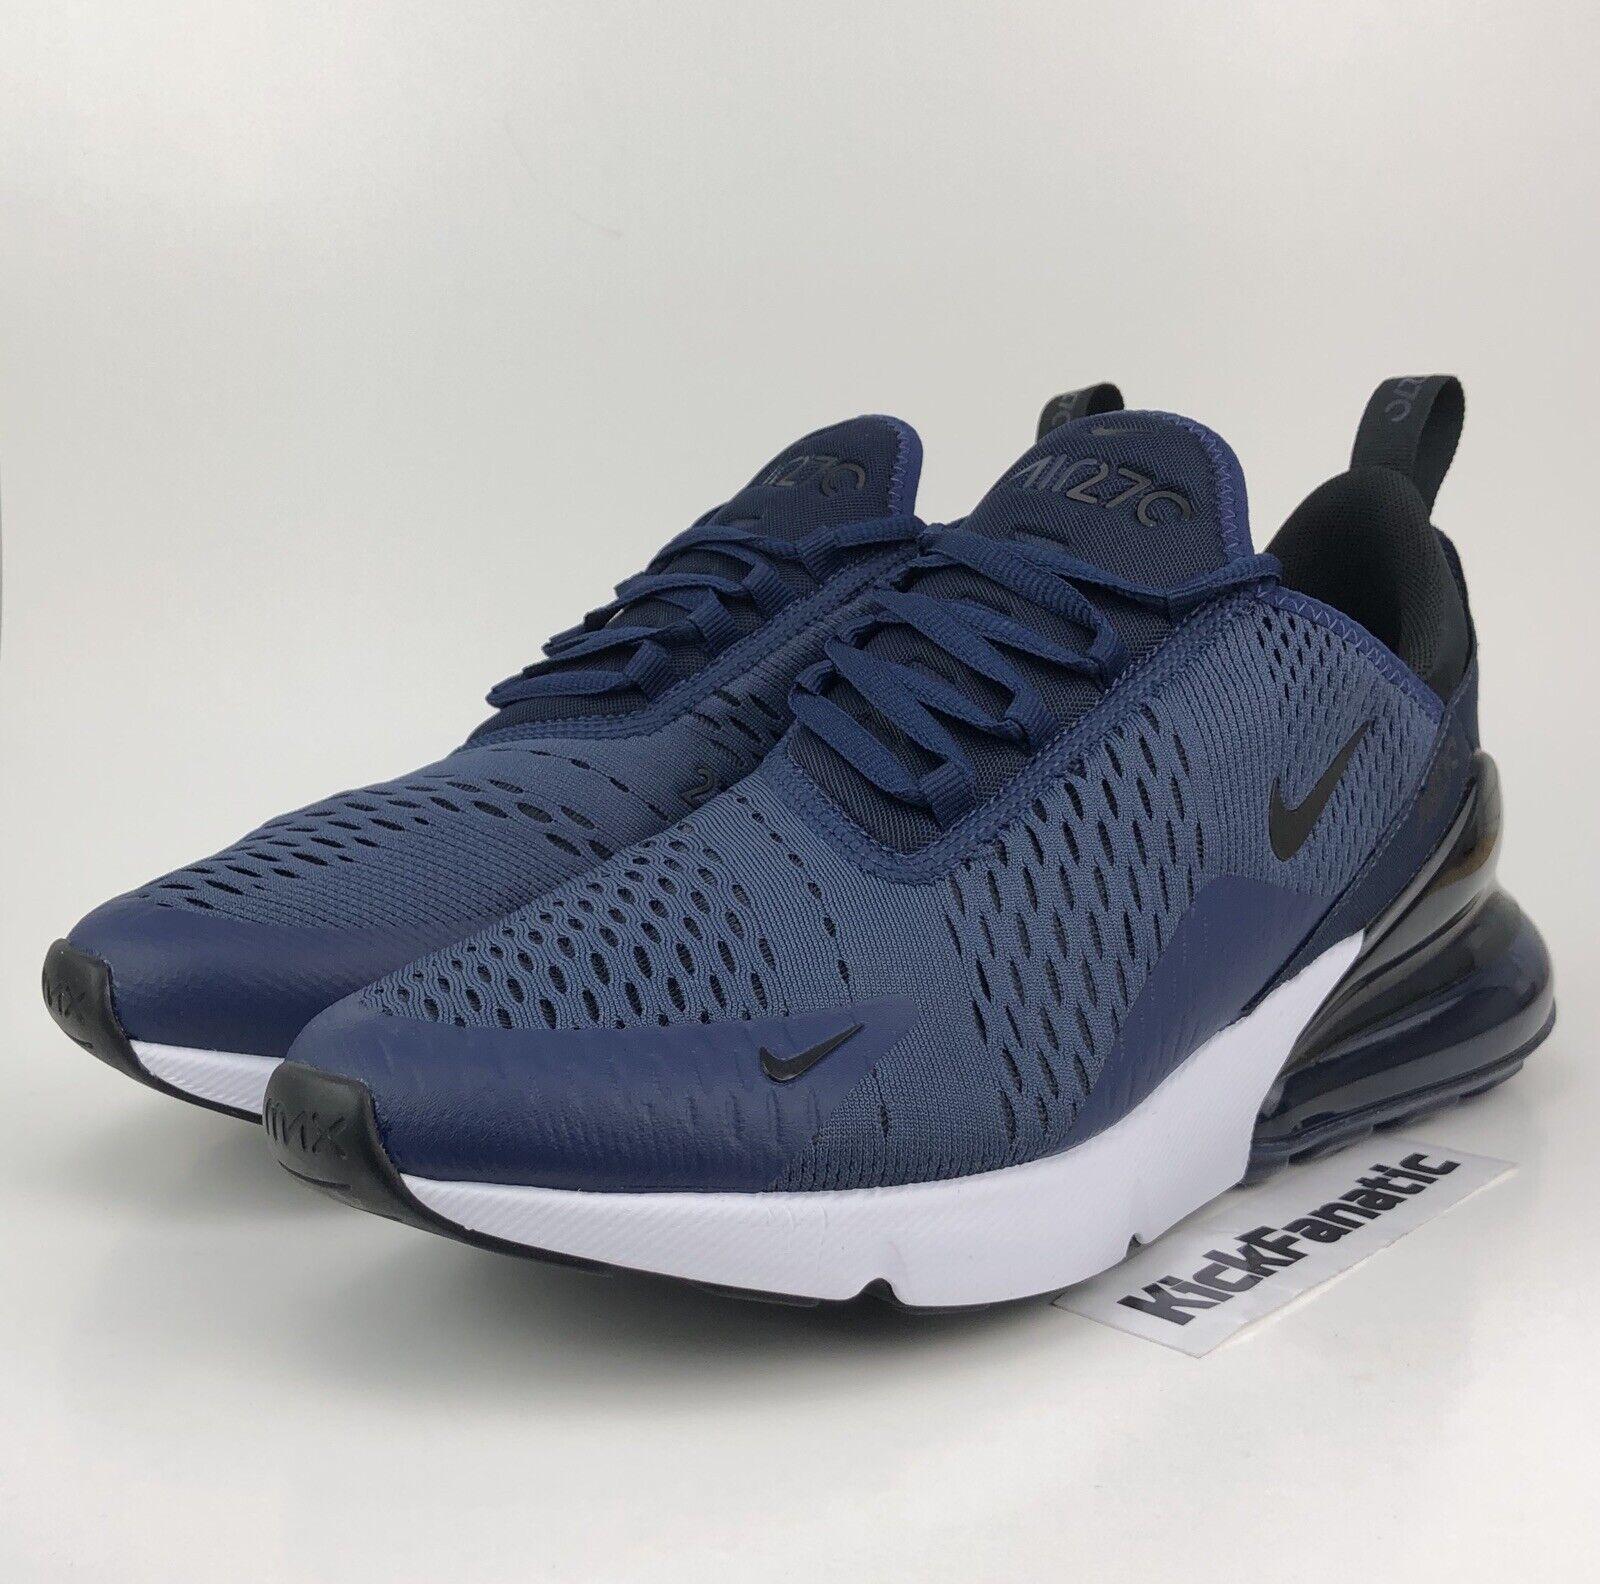 Keevin Nike Air MAX 270 blue Running Shoes AH8050 400